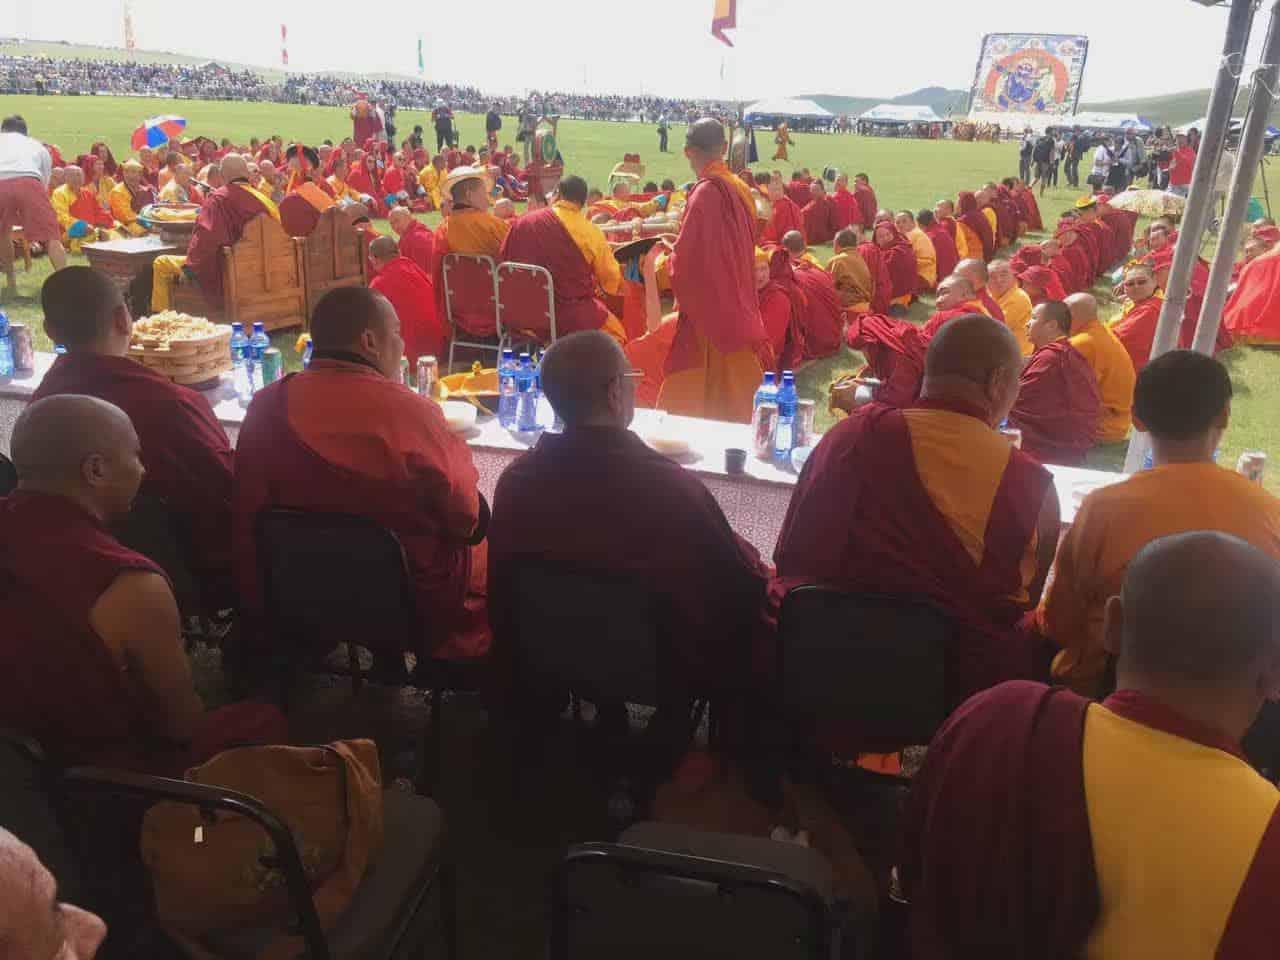 gosok-rinpoche-mongolia-2016-beb551ed95bd430225f69dd31be0955